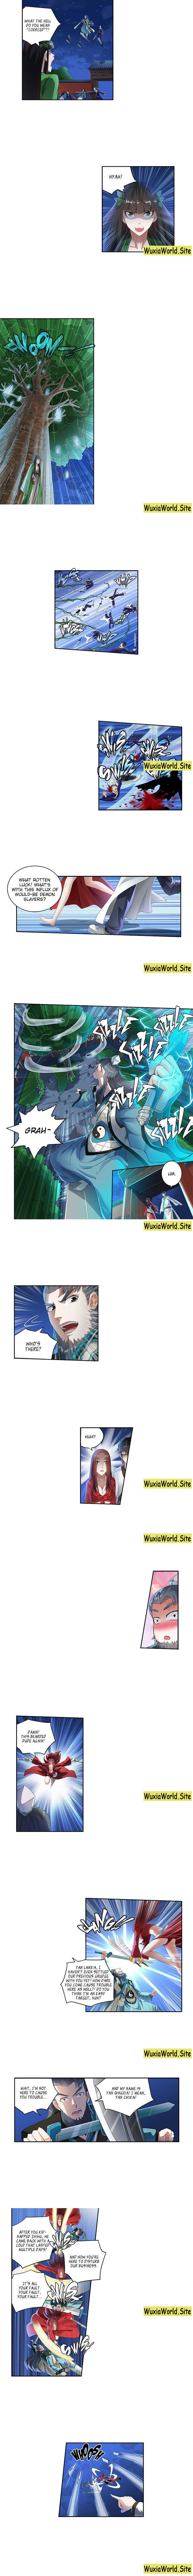 https://manga.mangadogs.com/comics/pic2/13/21773/963898/b983273d87ce44aec57595123cee4c62.jpg Page 1